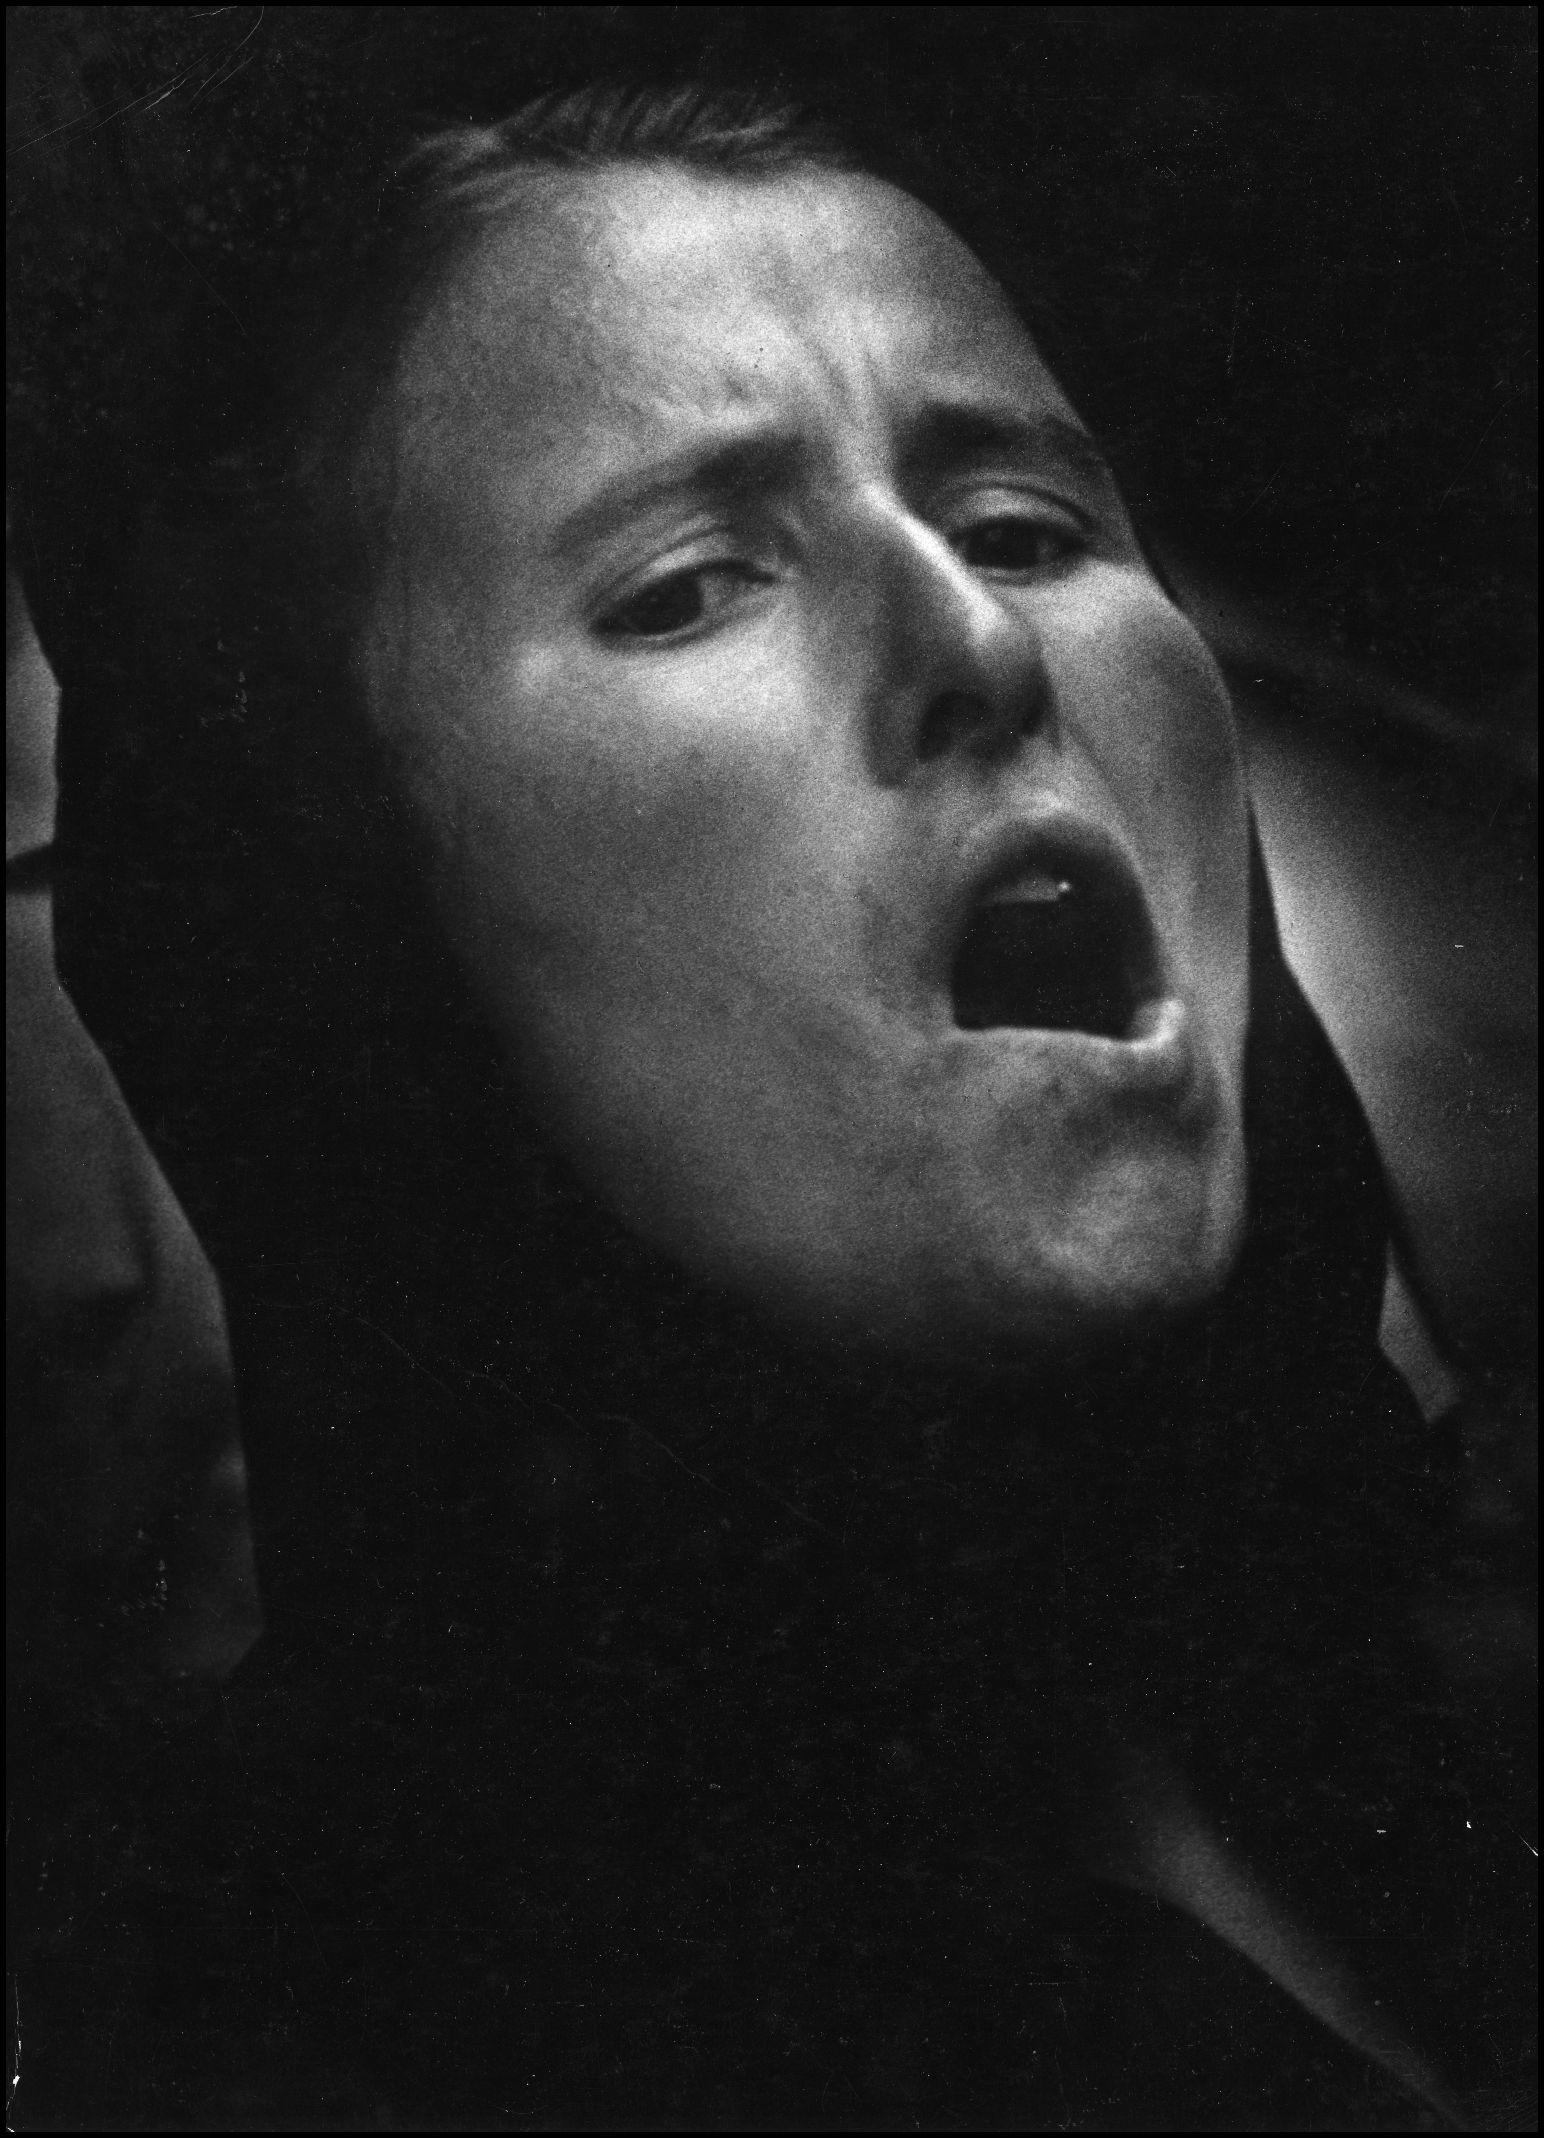 Ivan Dvoršak, Klic, 1963, črno-bela fotografija, digitalizacija Stojan Kerbler